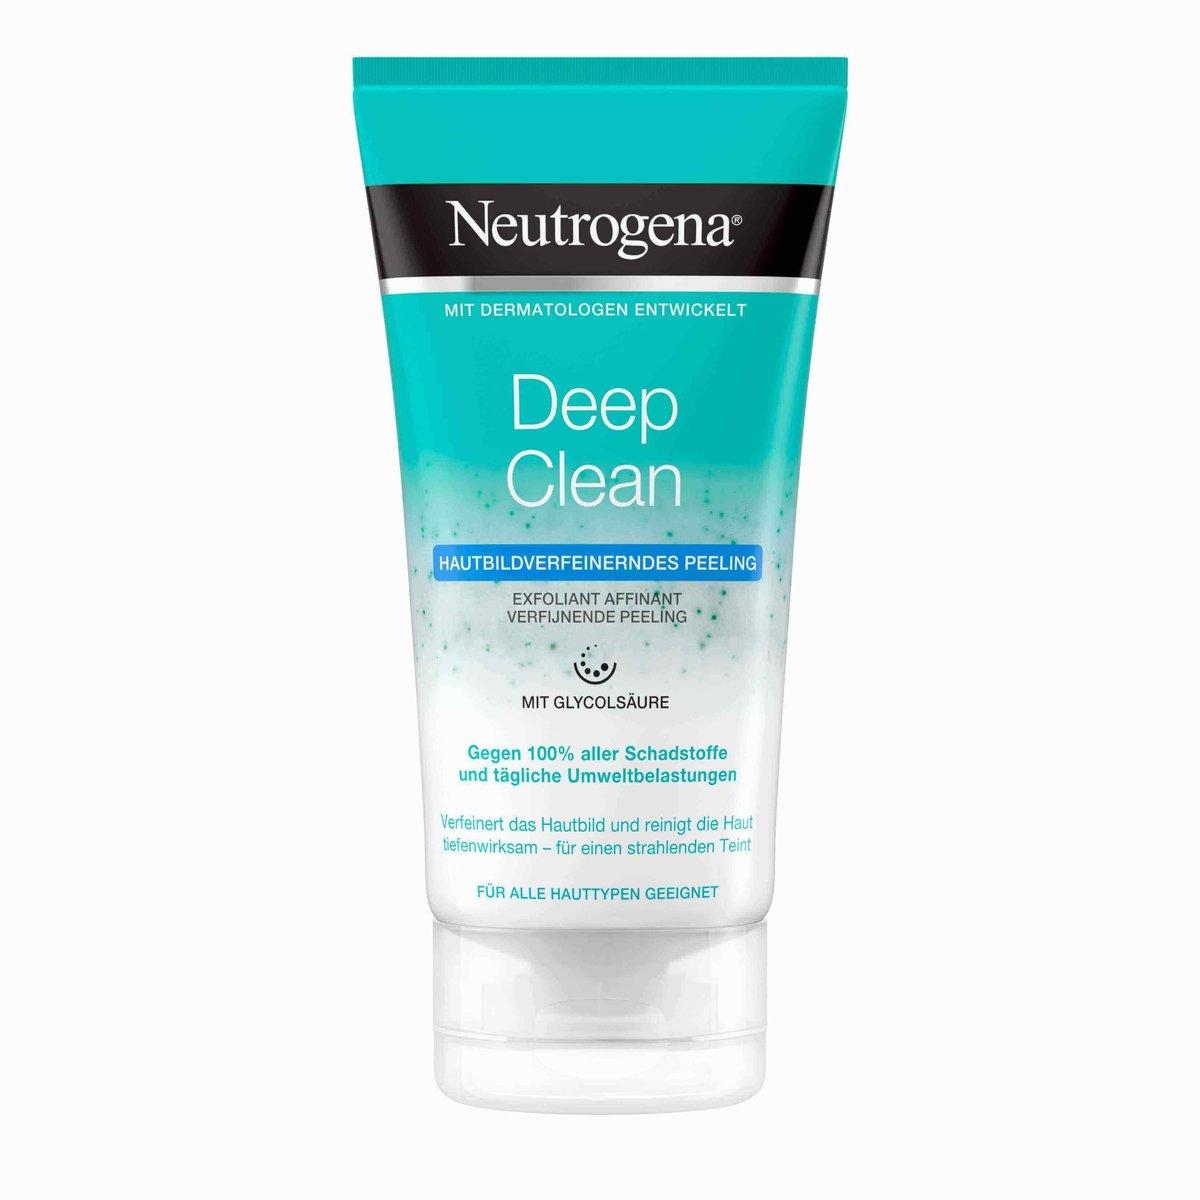 Deep Clean Hautbildverfeinerndes Peeling